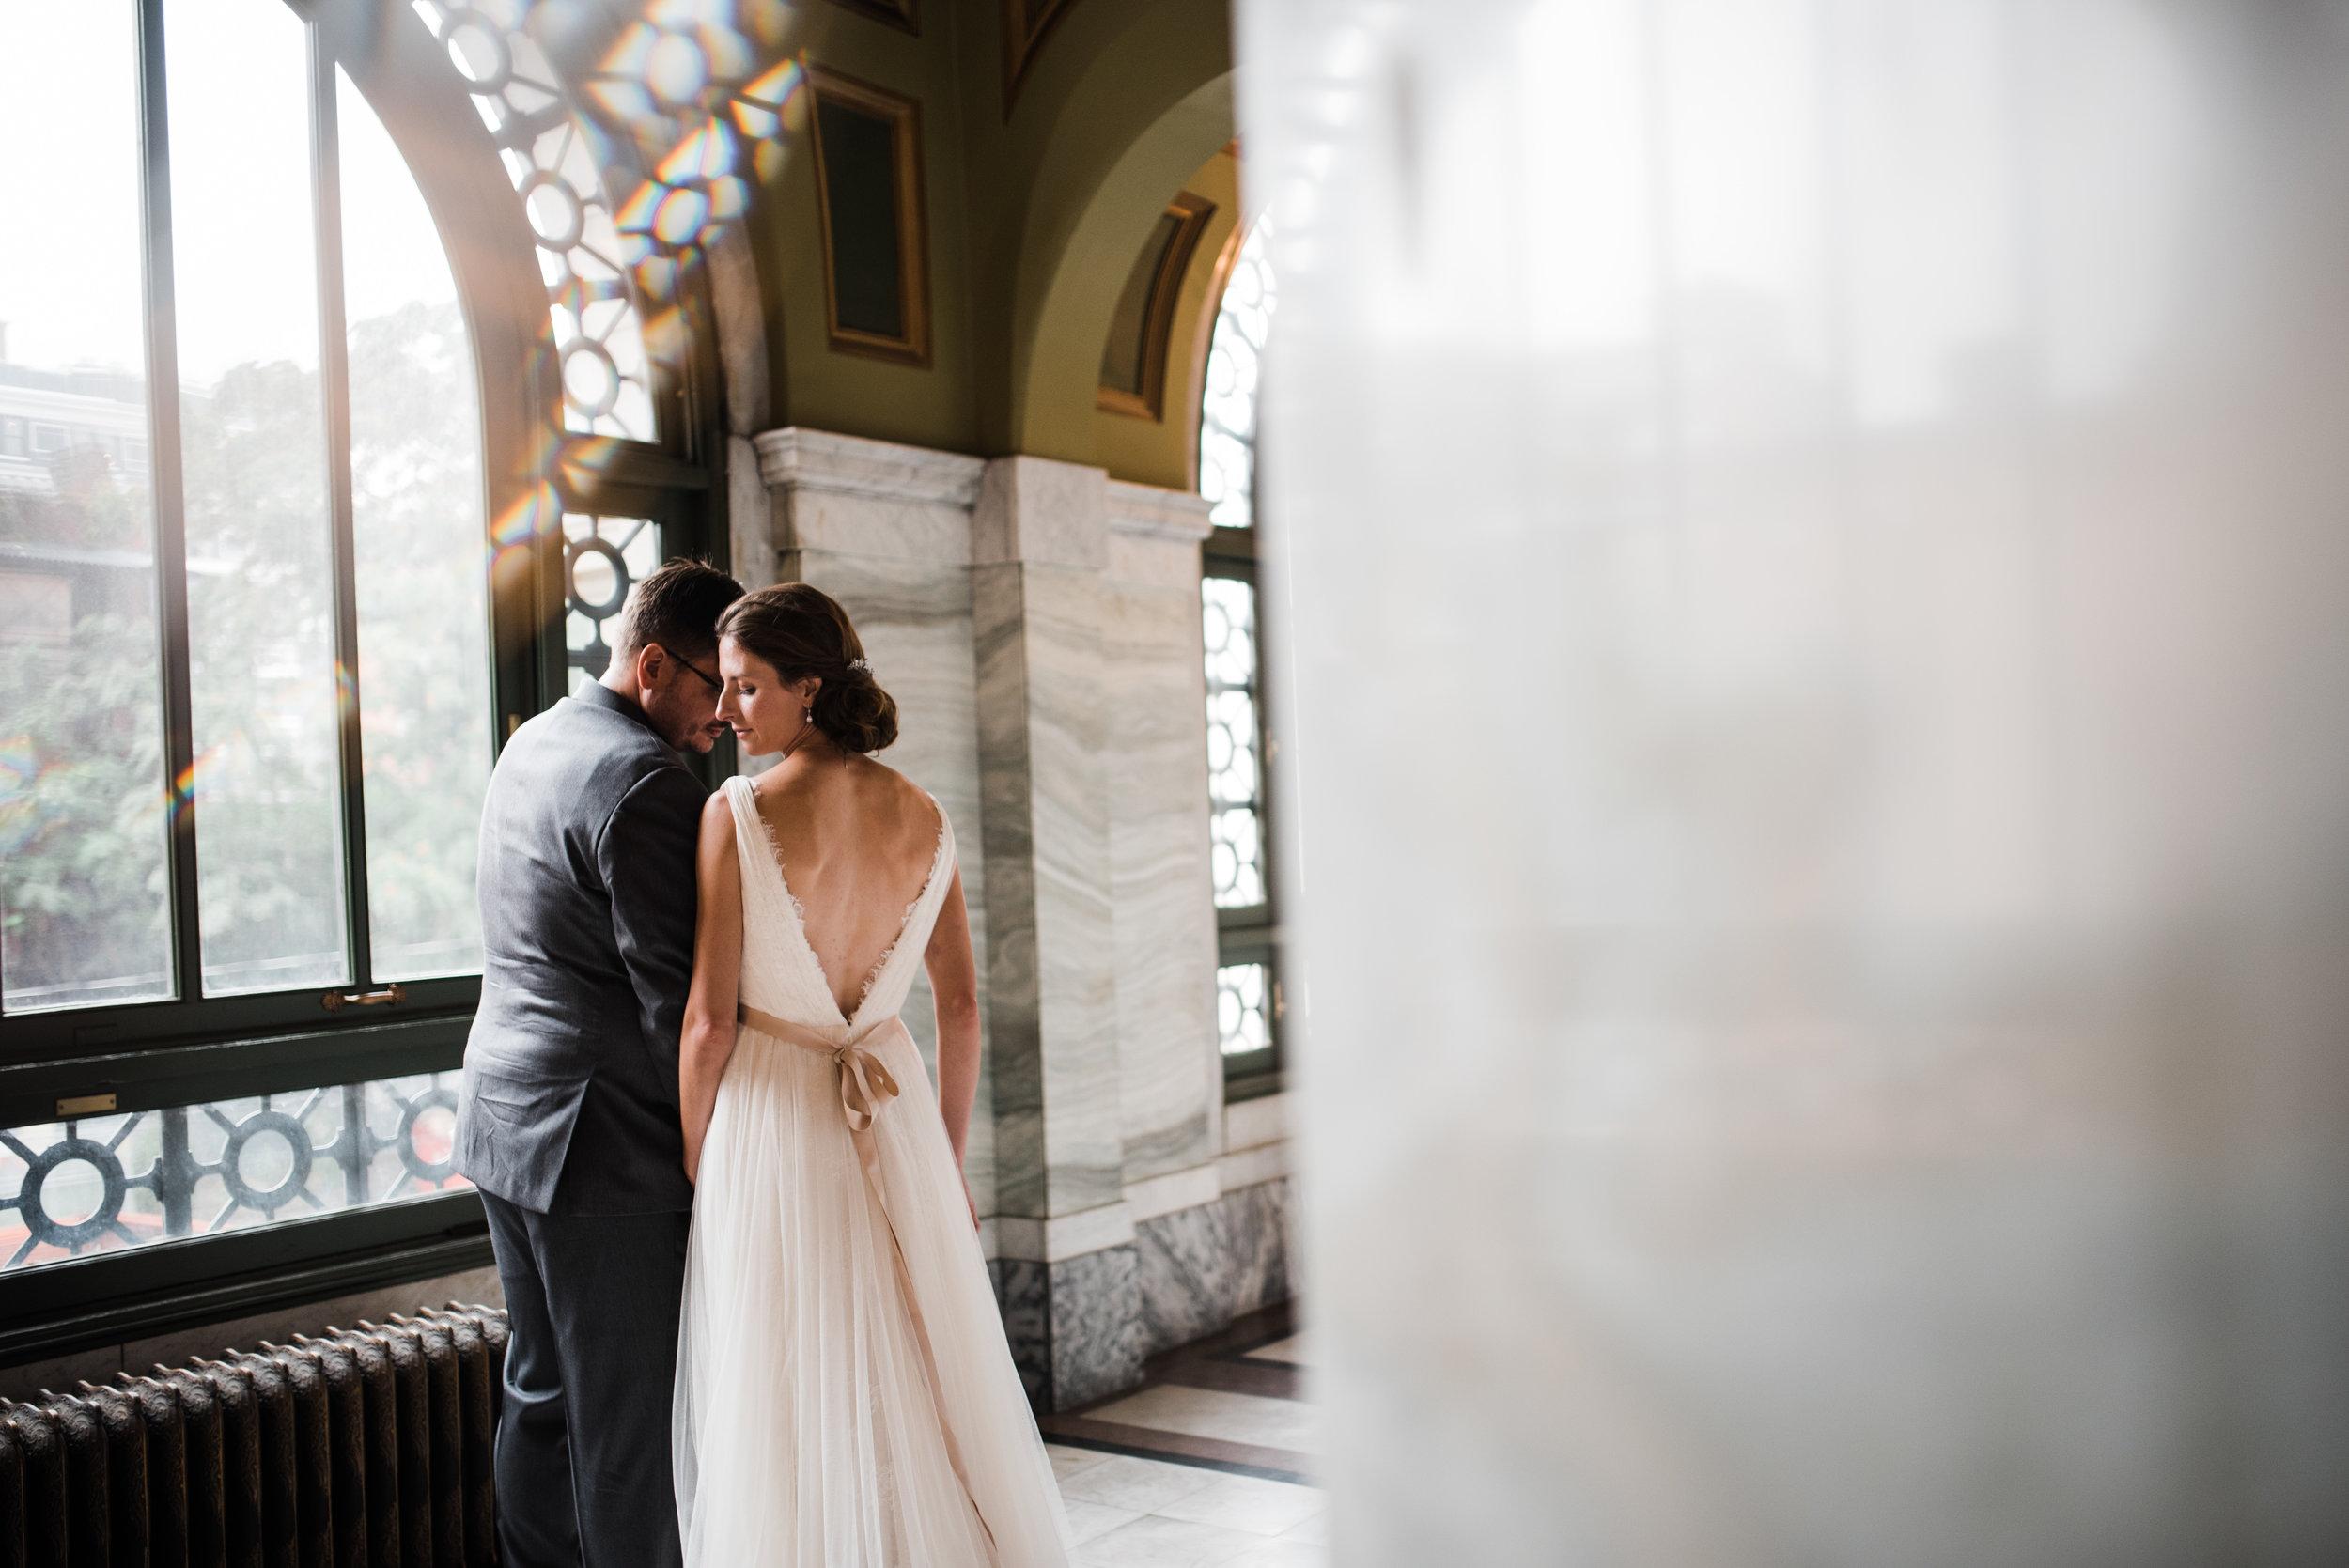 cincinnati-wedding-photographer-chelsea-hall-photography-memorial-hall-14.jpg